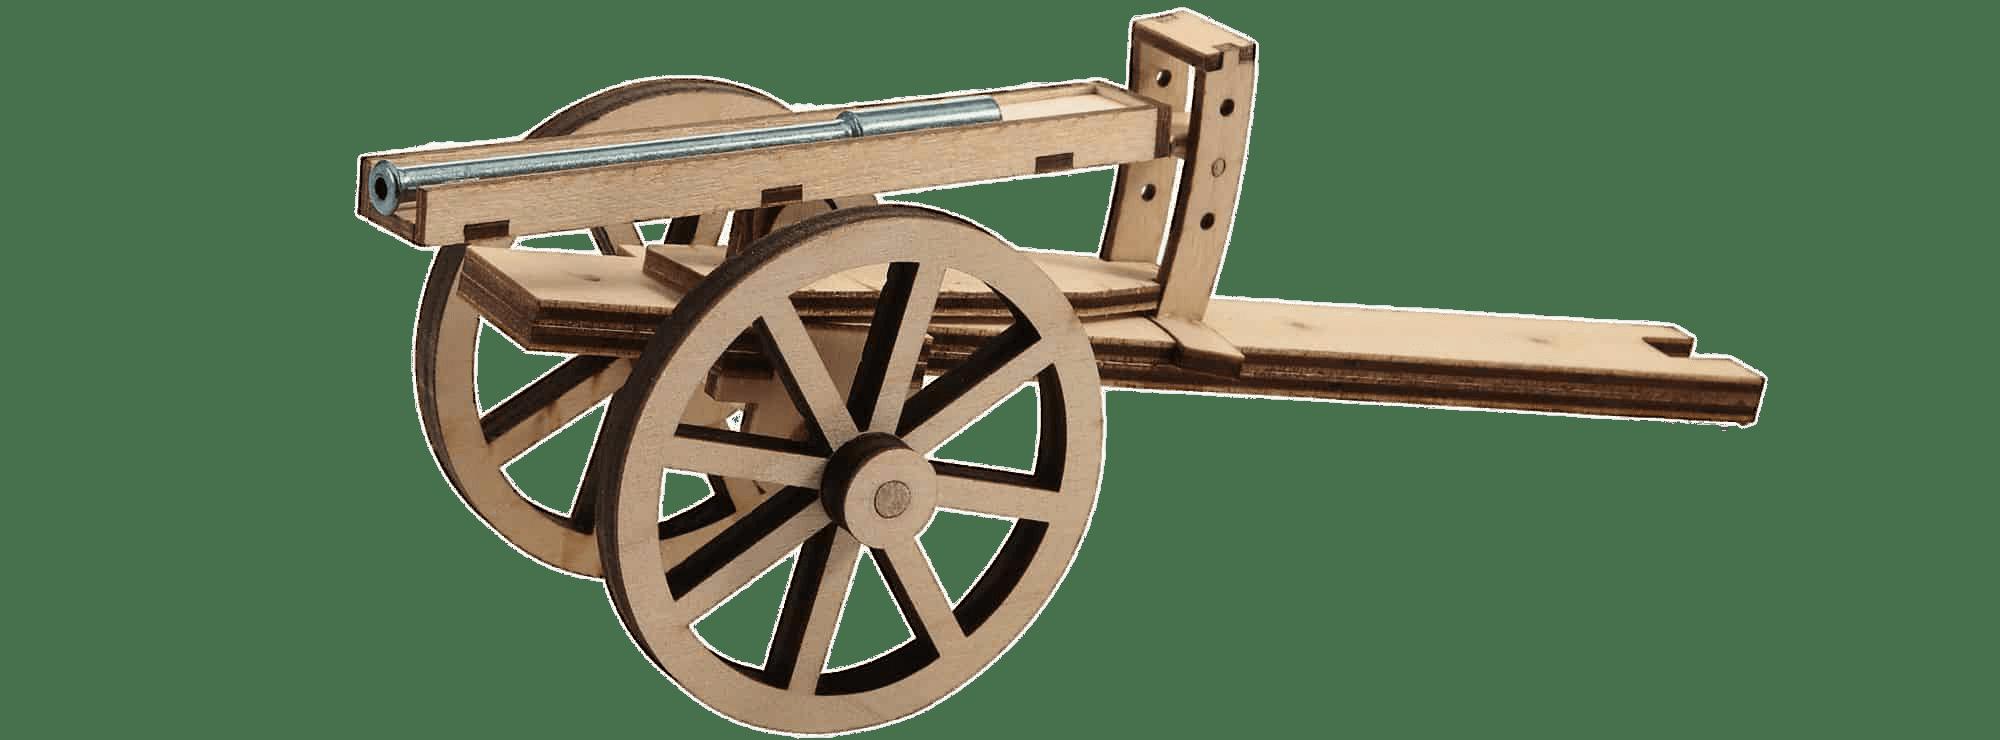 Wagon clipart oxcart. Leonardo da vinci canon